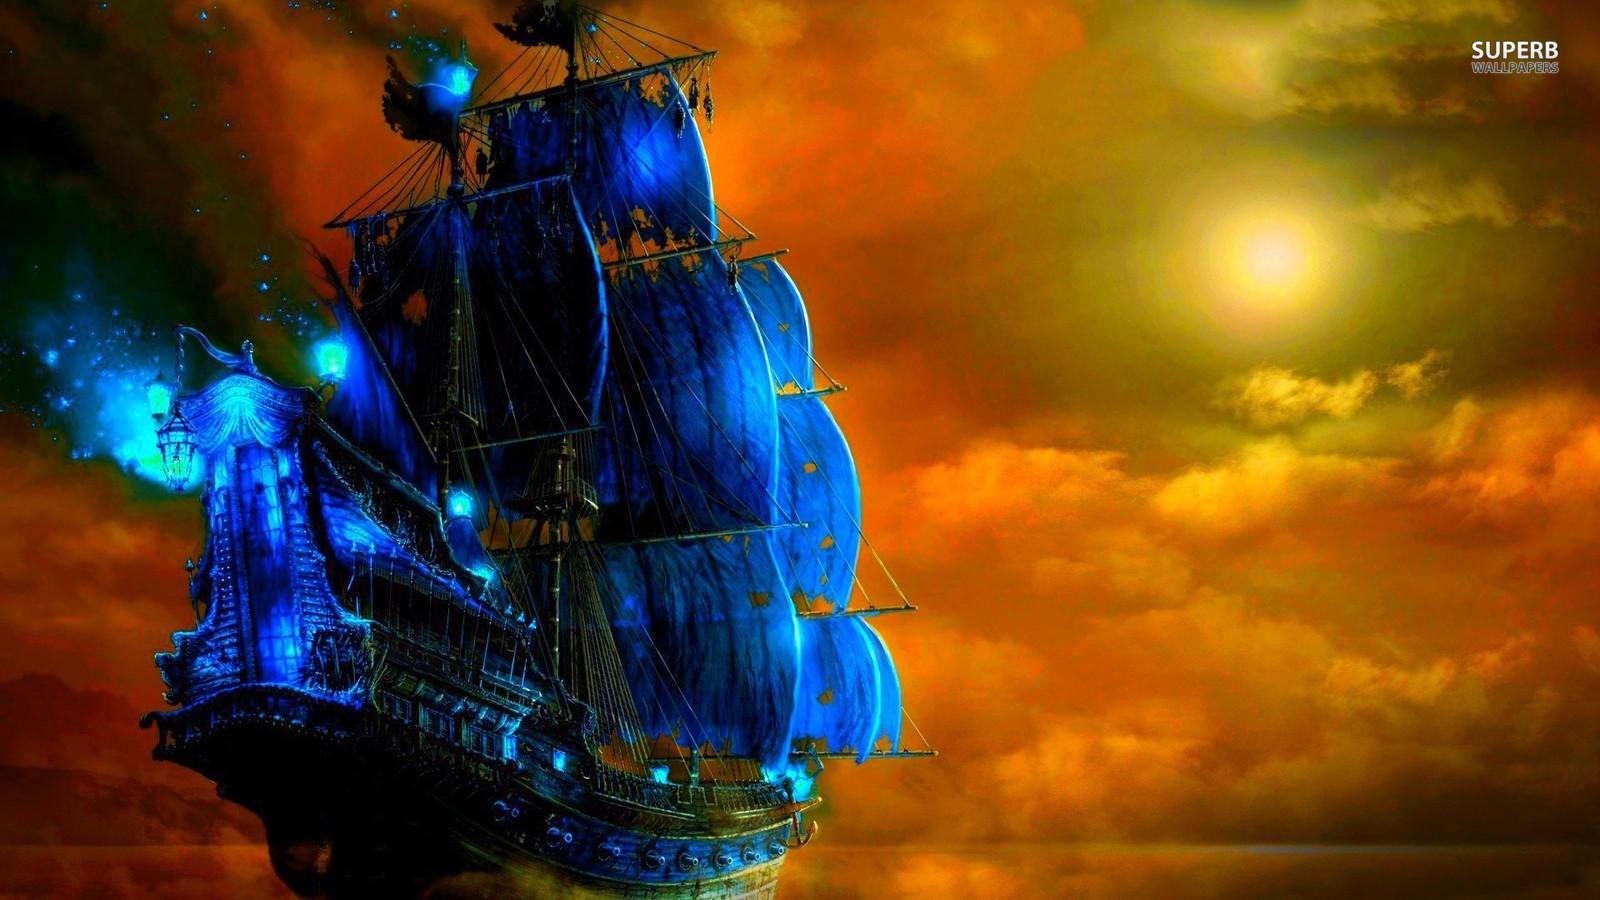 pirate ghost ship wallpaper